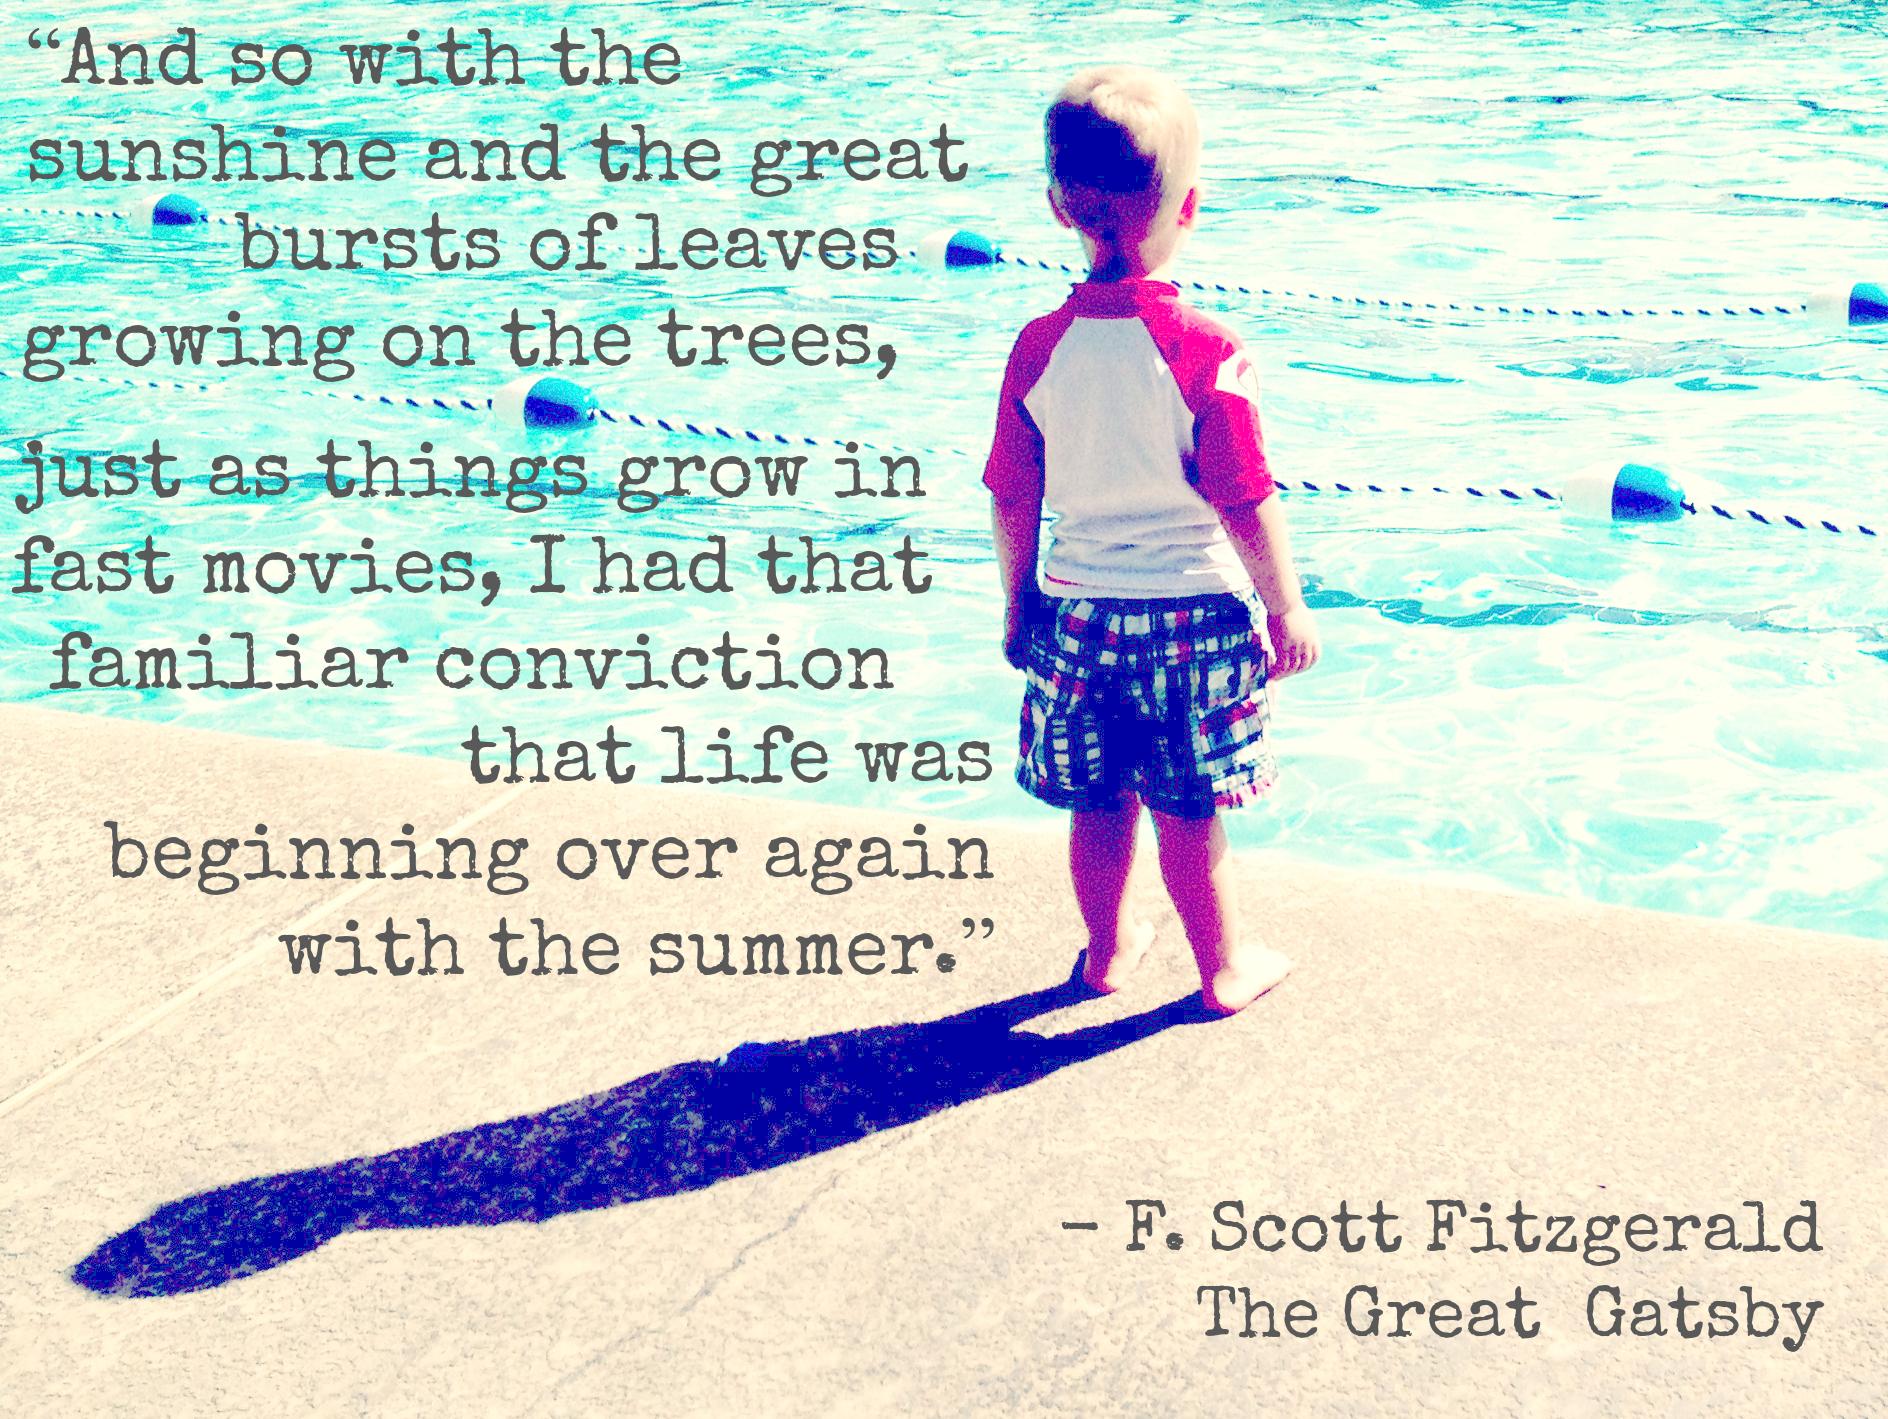 F Scott Fitzgerald Summer Quote.jpg